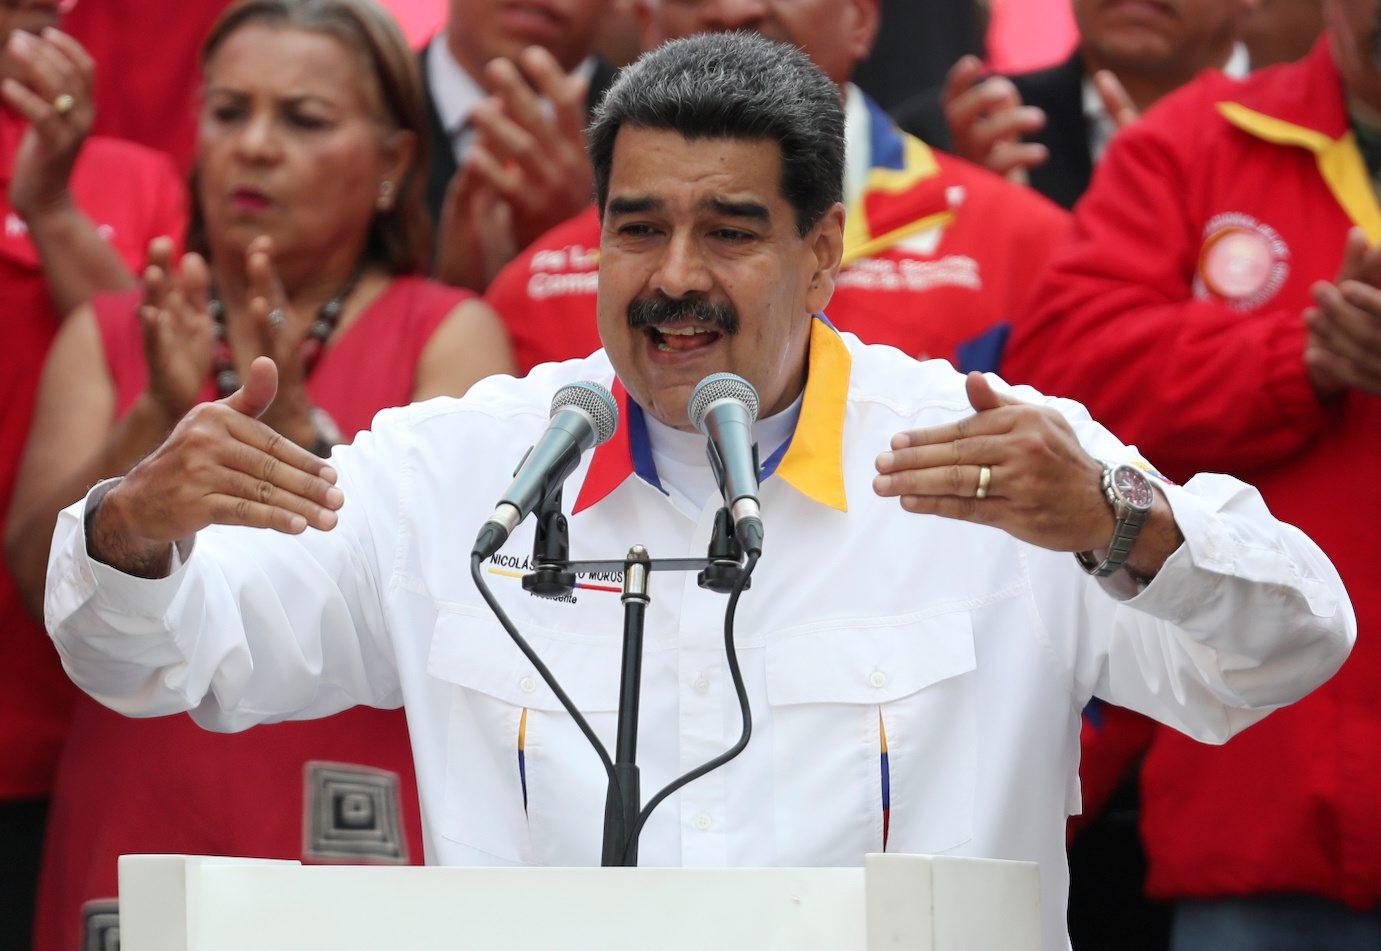 2019-05-20T202849Z_1964065346_RC1B60C69550_RTRMADP_3_VENEZUELA-POLITICS